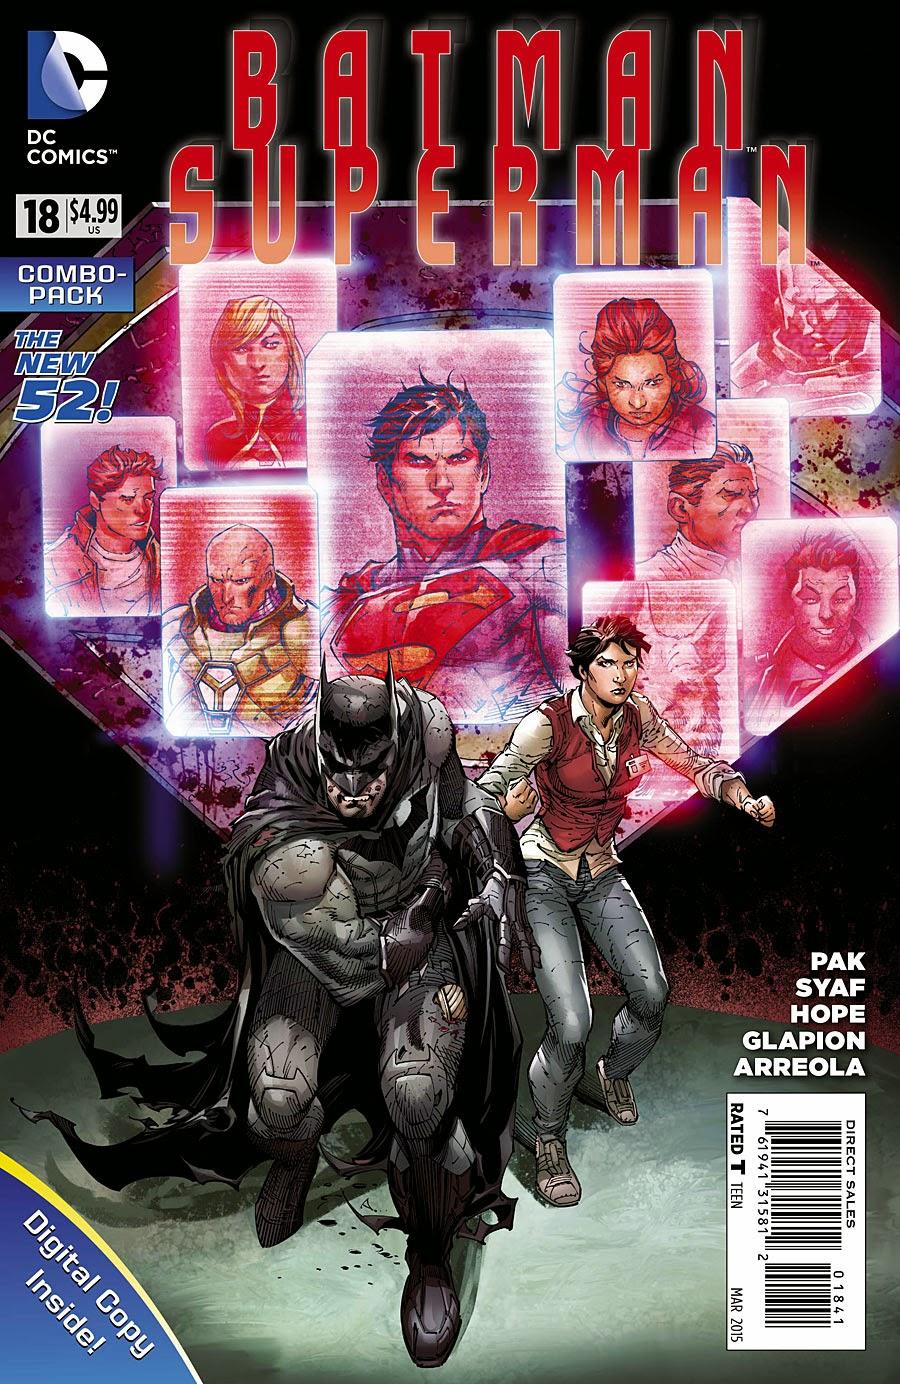 BMSM Cv18 543dabfe3fe773.00220717 - Primer vistazo a Batman/Superman #18